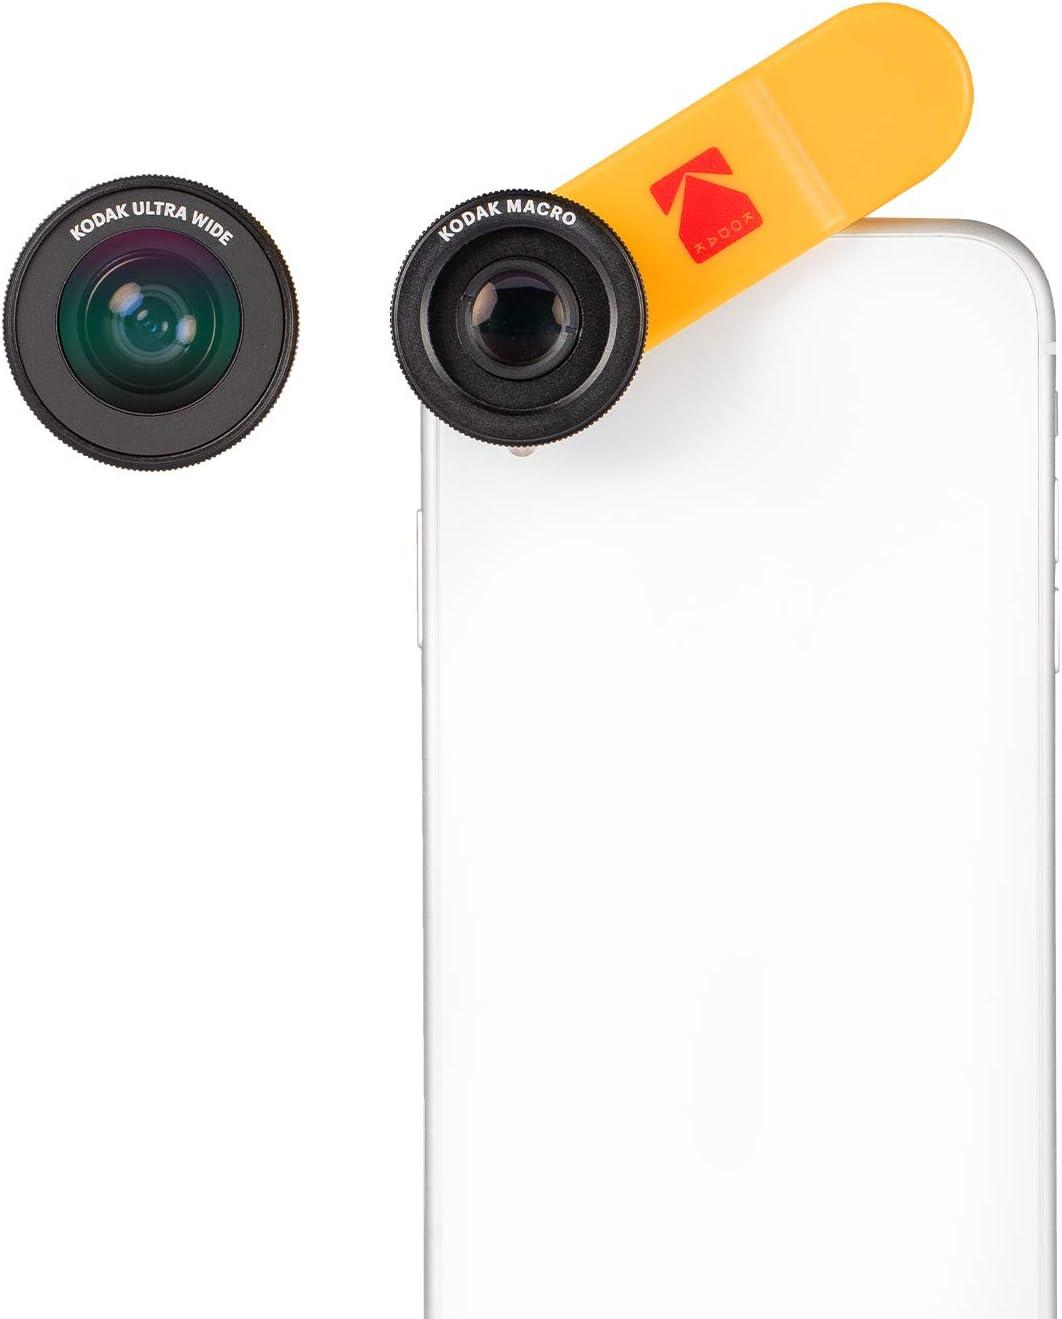 Kodak 2 In 1 Vorsatzlinsen Set Für Smartphones Elektronik